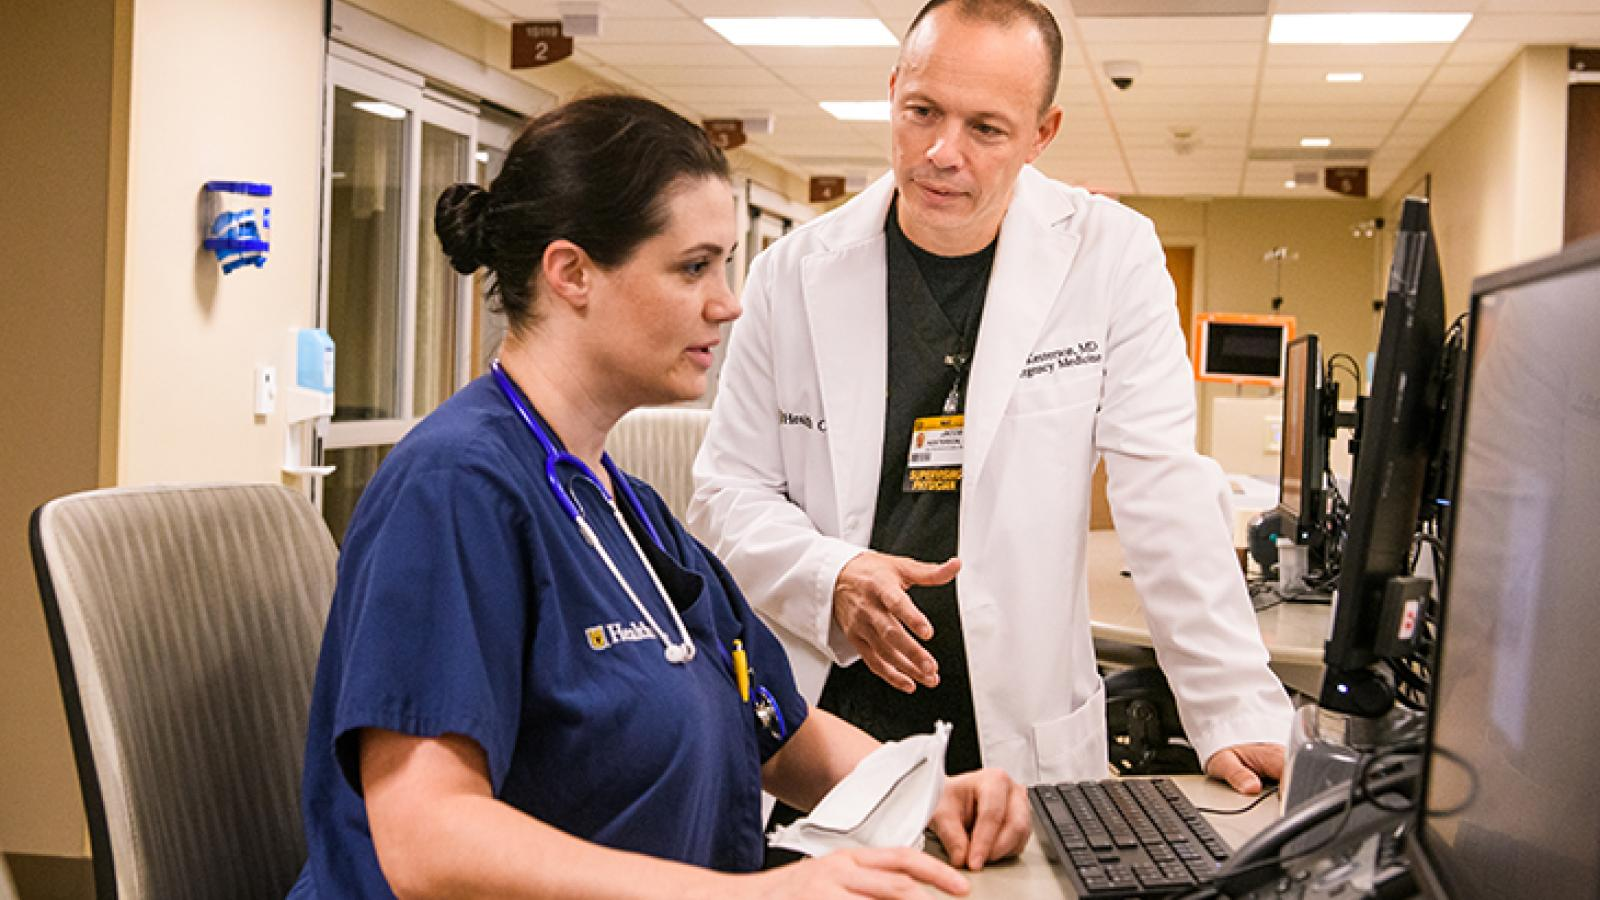 EM Dr. Kesterson with staff